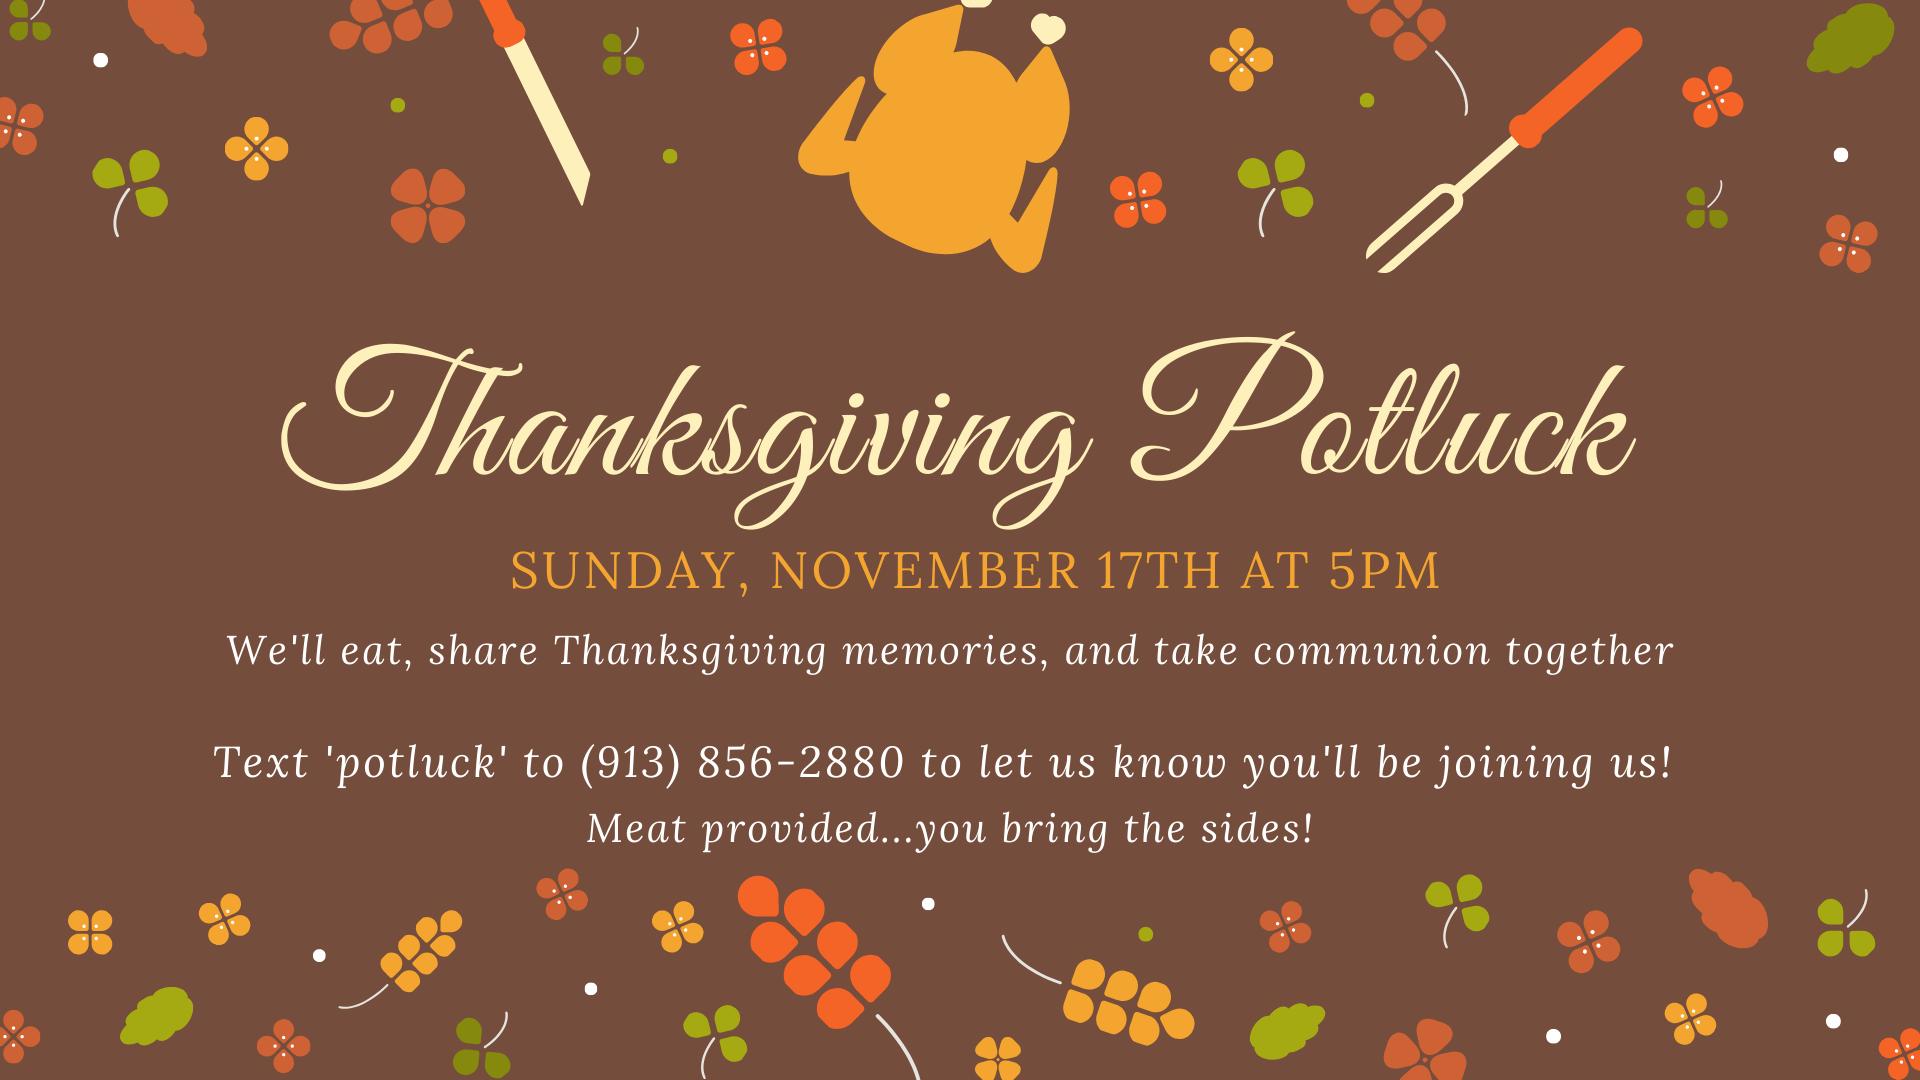 Thanksgiving-Potluck-2019-1-1